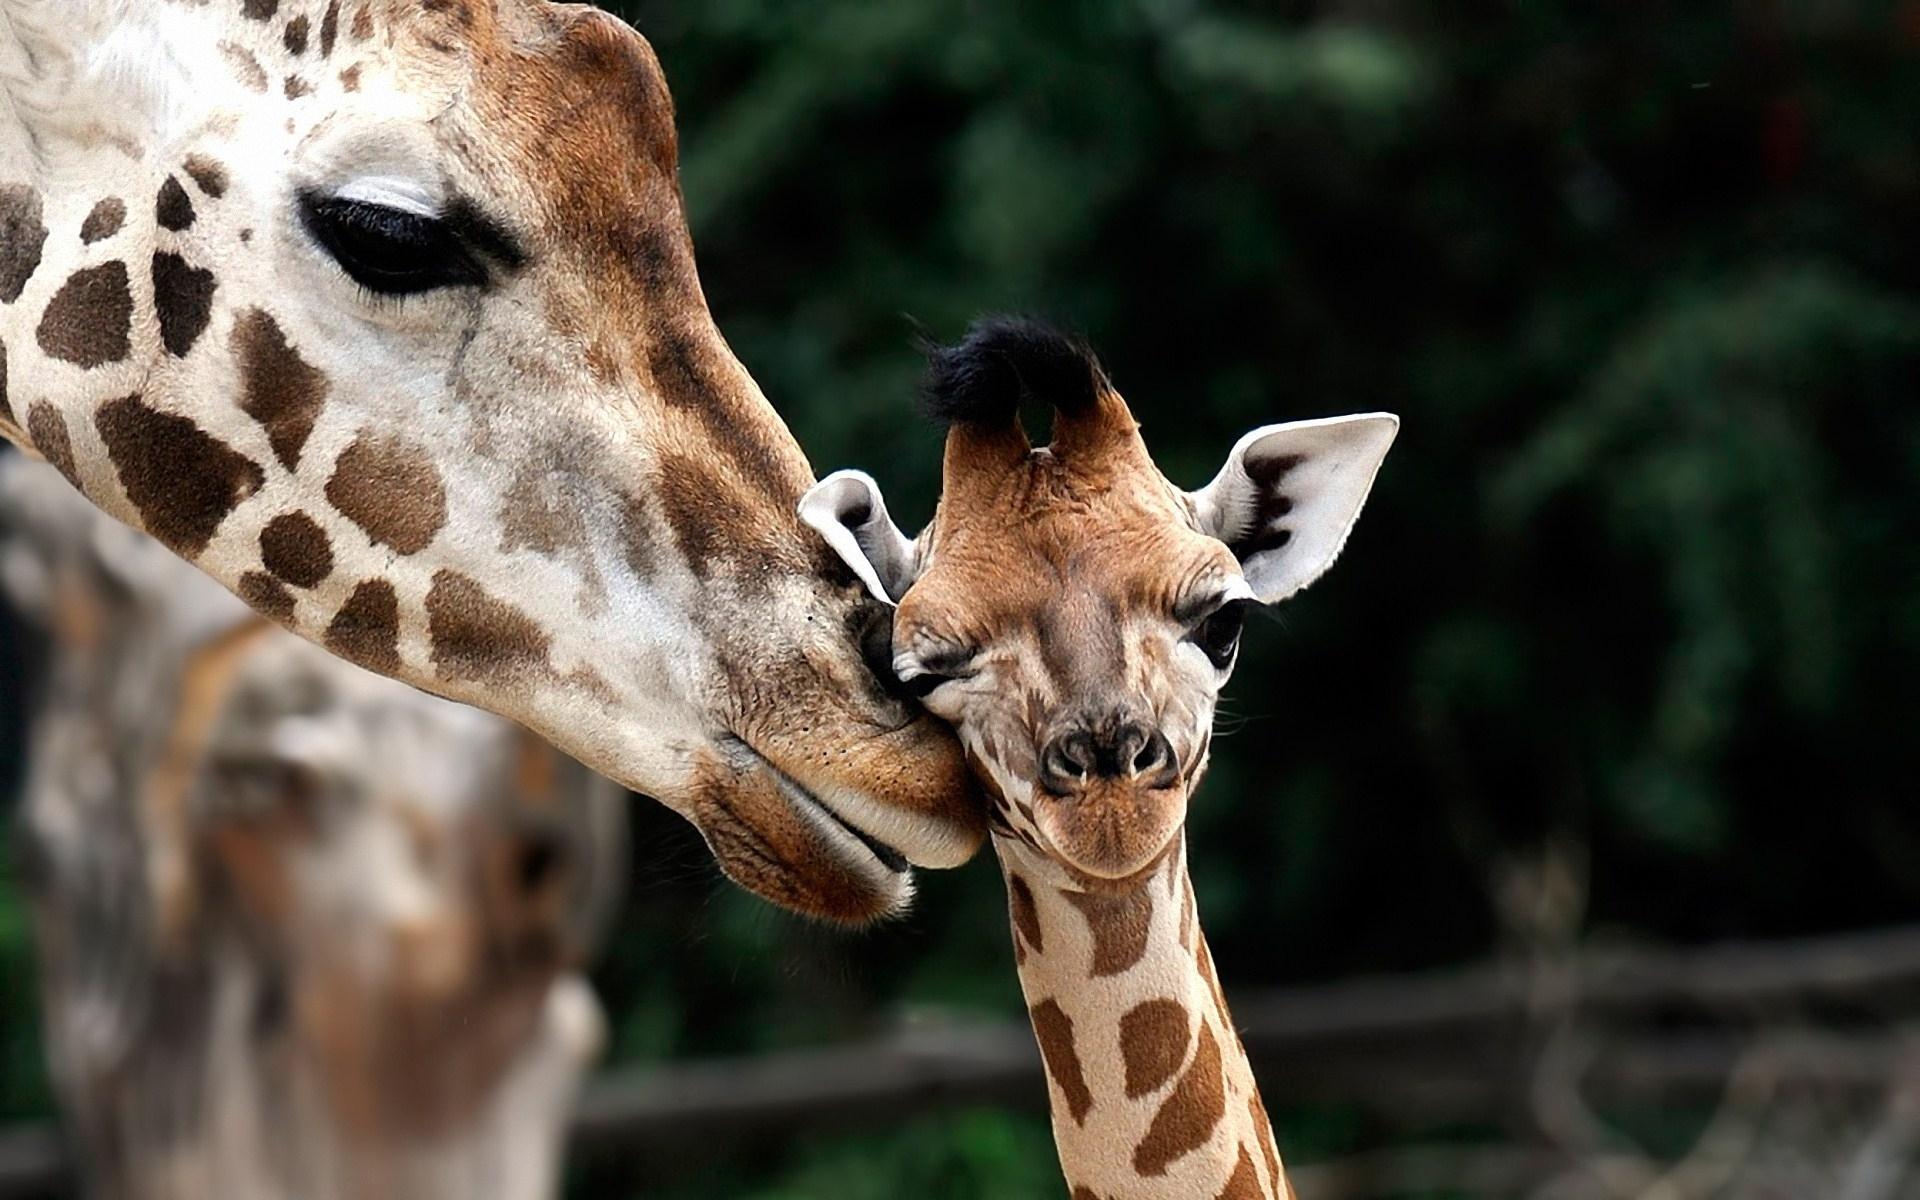 10 best baby animals desktop wallpaper full hd 1080p for pc desktop